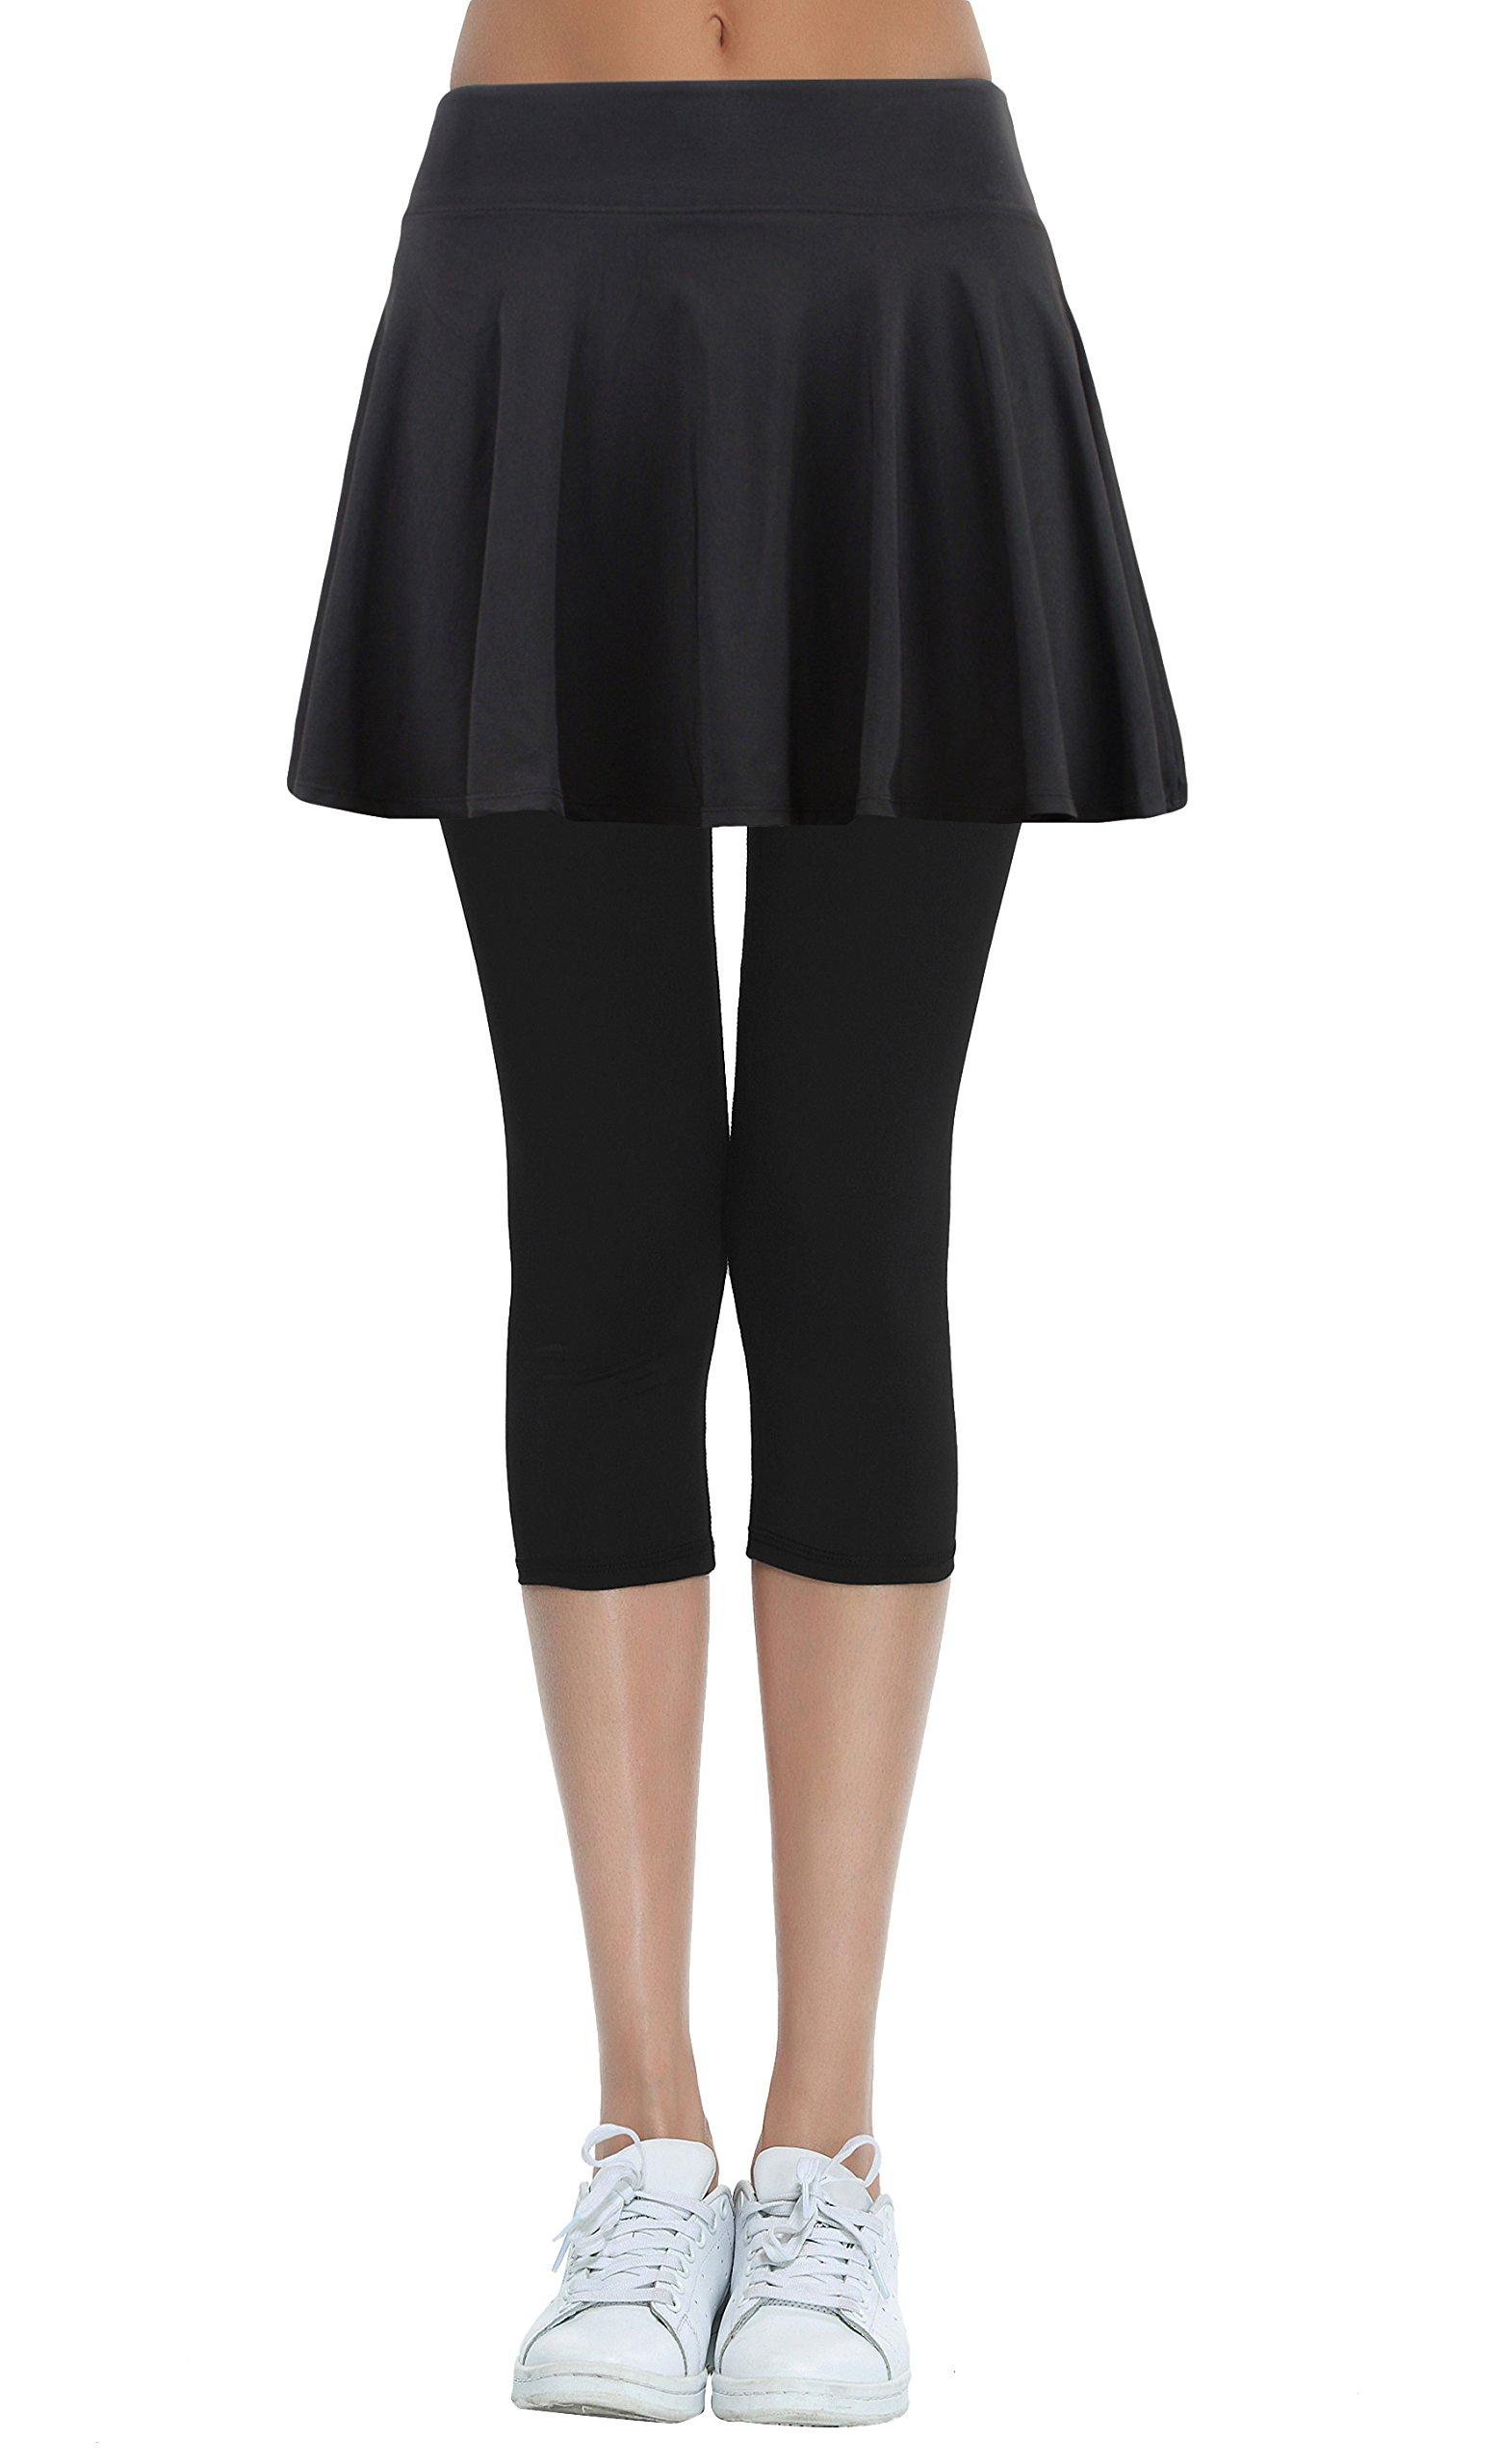 HonourSport Women's Skirted Capri Leggings, Active Tennis Printed Skorts(Black,L)